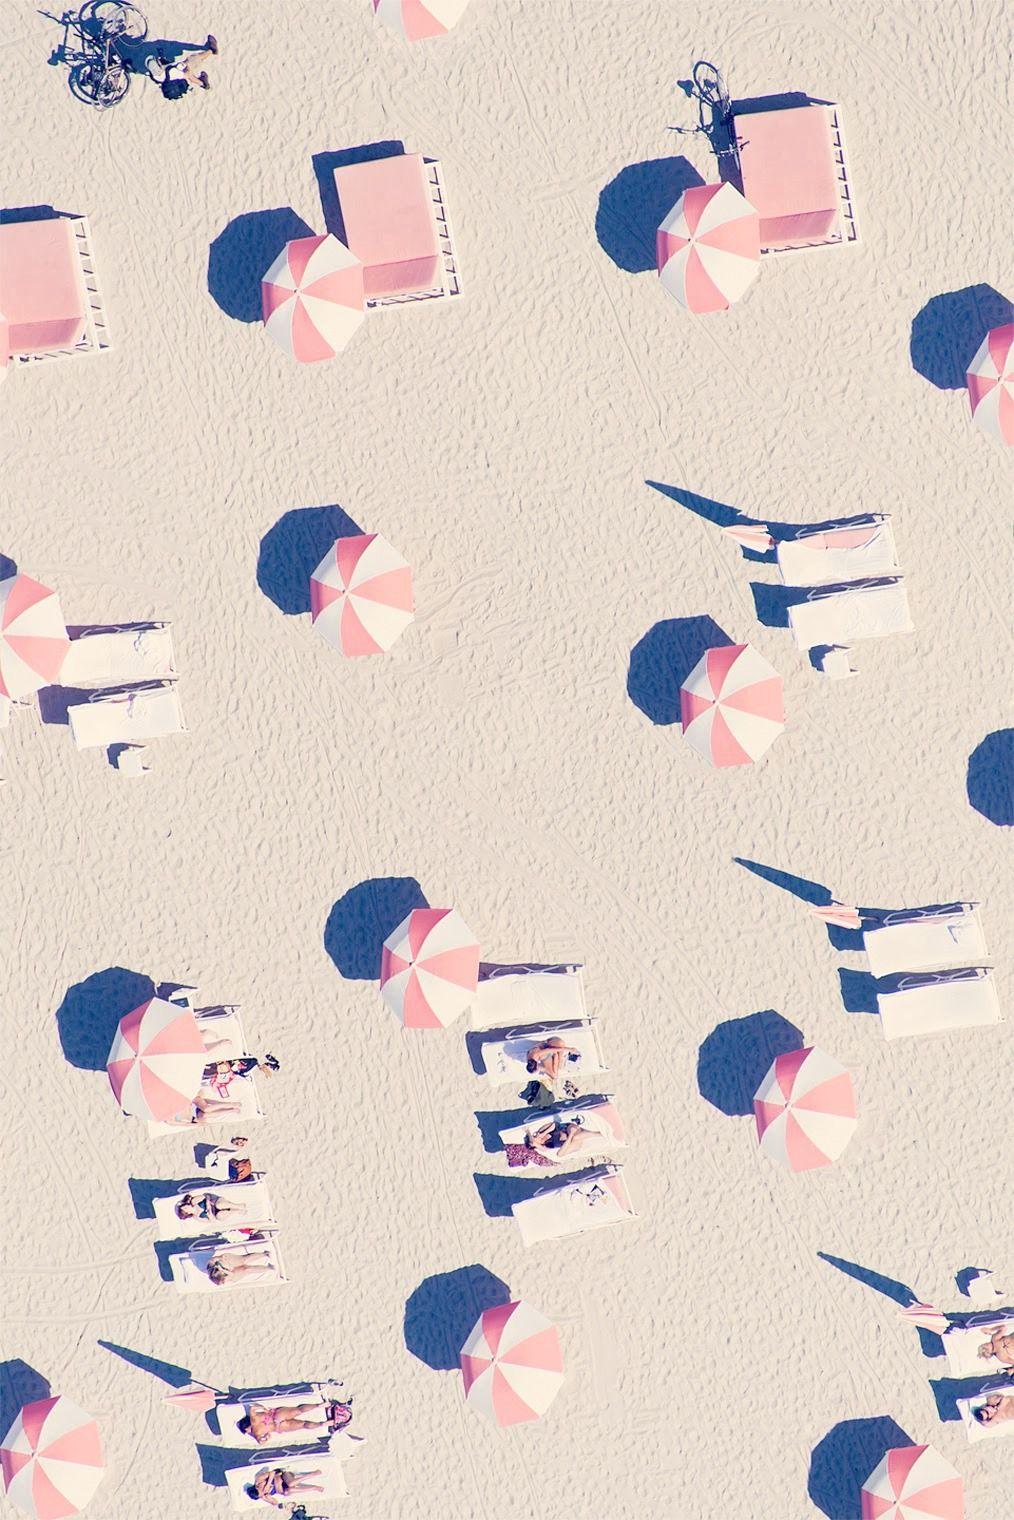 Pink Miami Beach Umbrellas  -  2014   -  Gray Malin photography   -  https://www.graymalin.com/